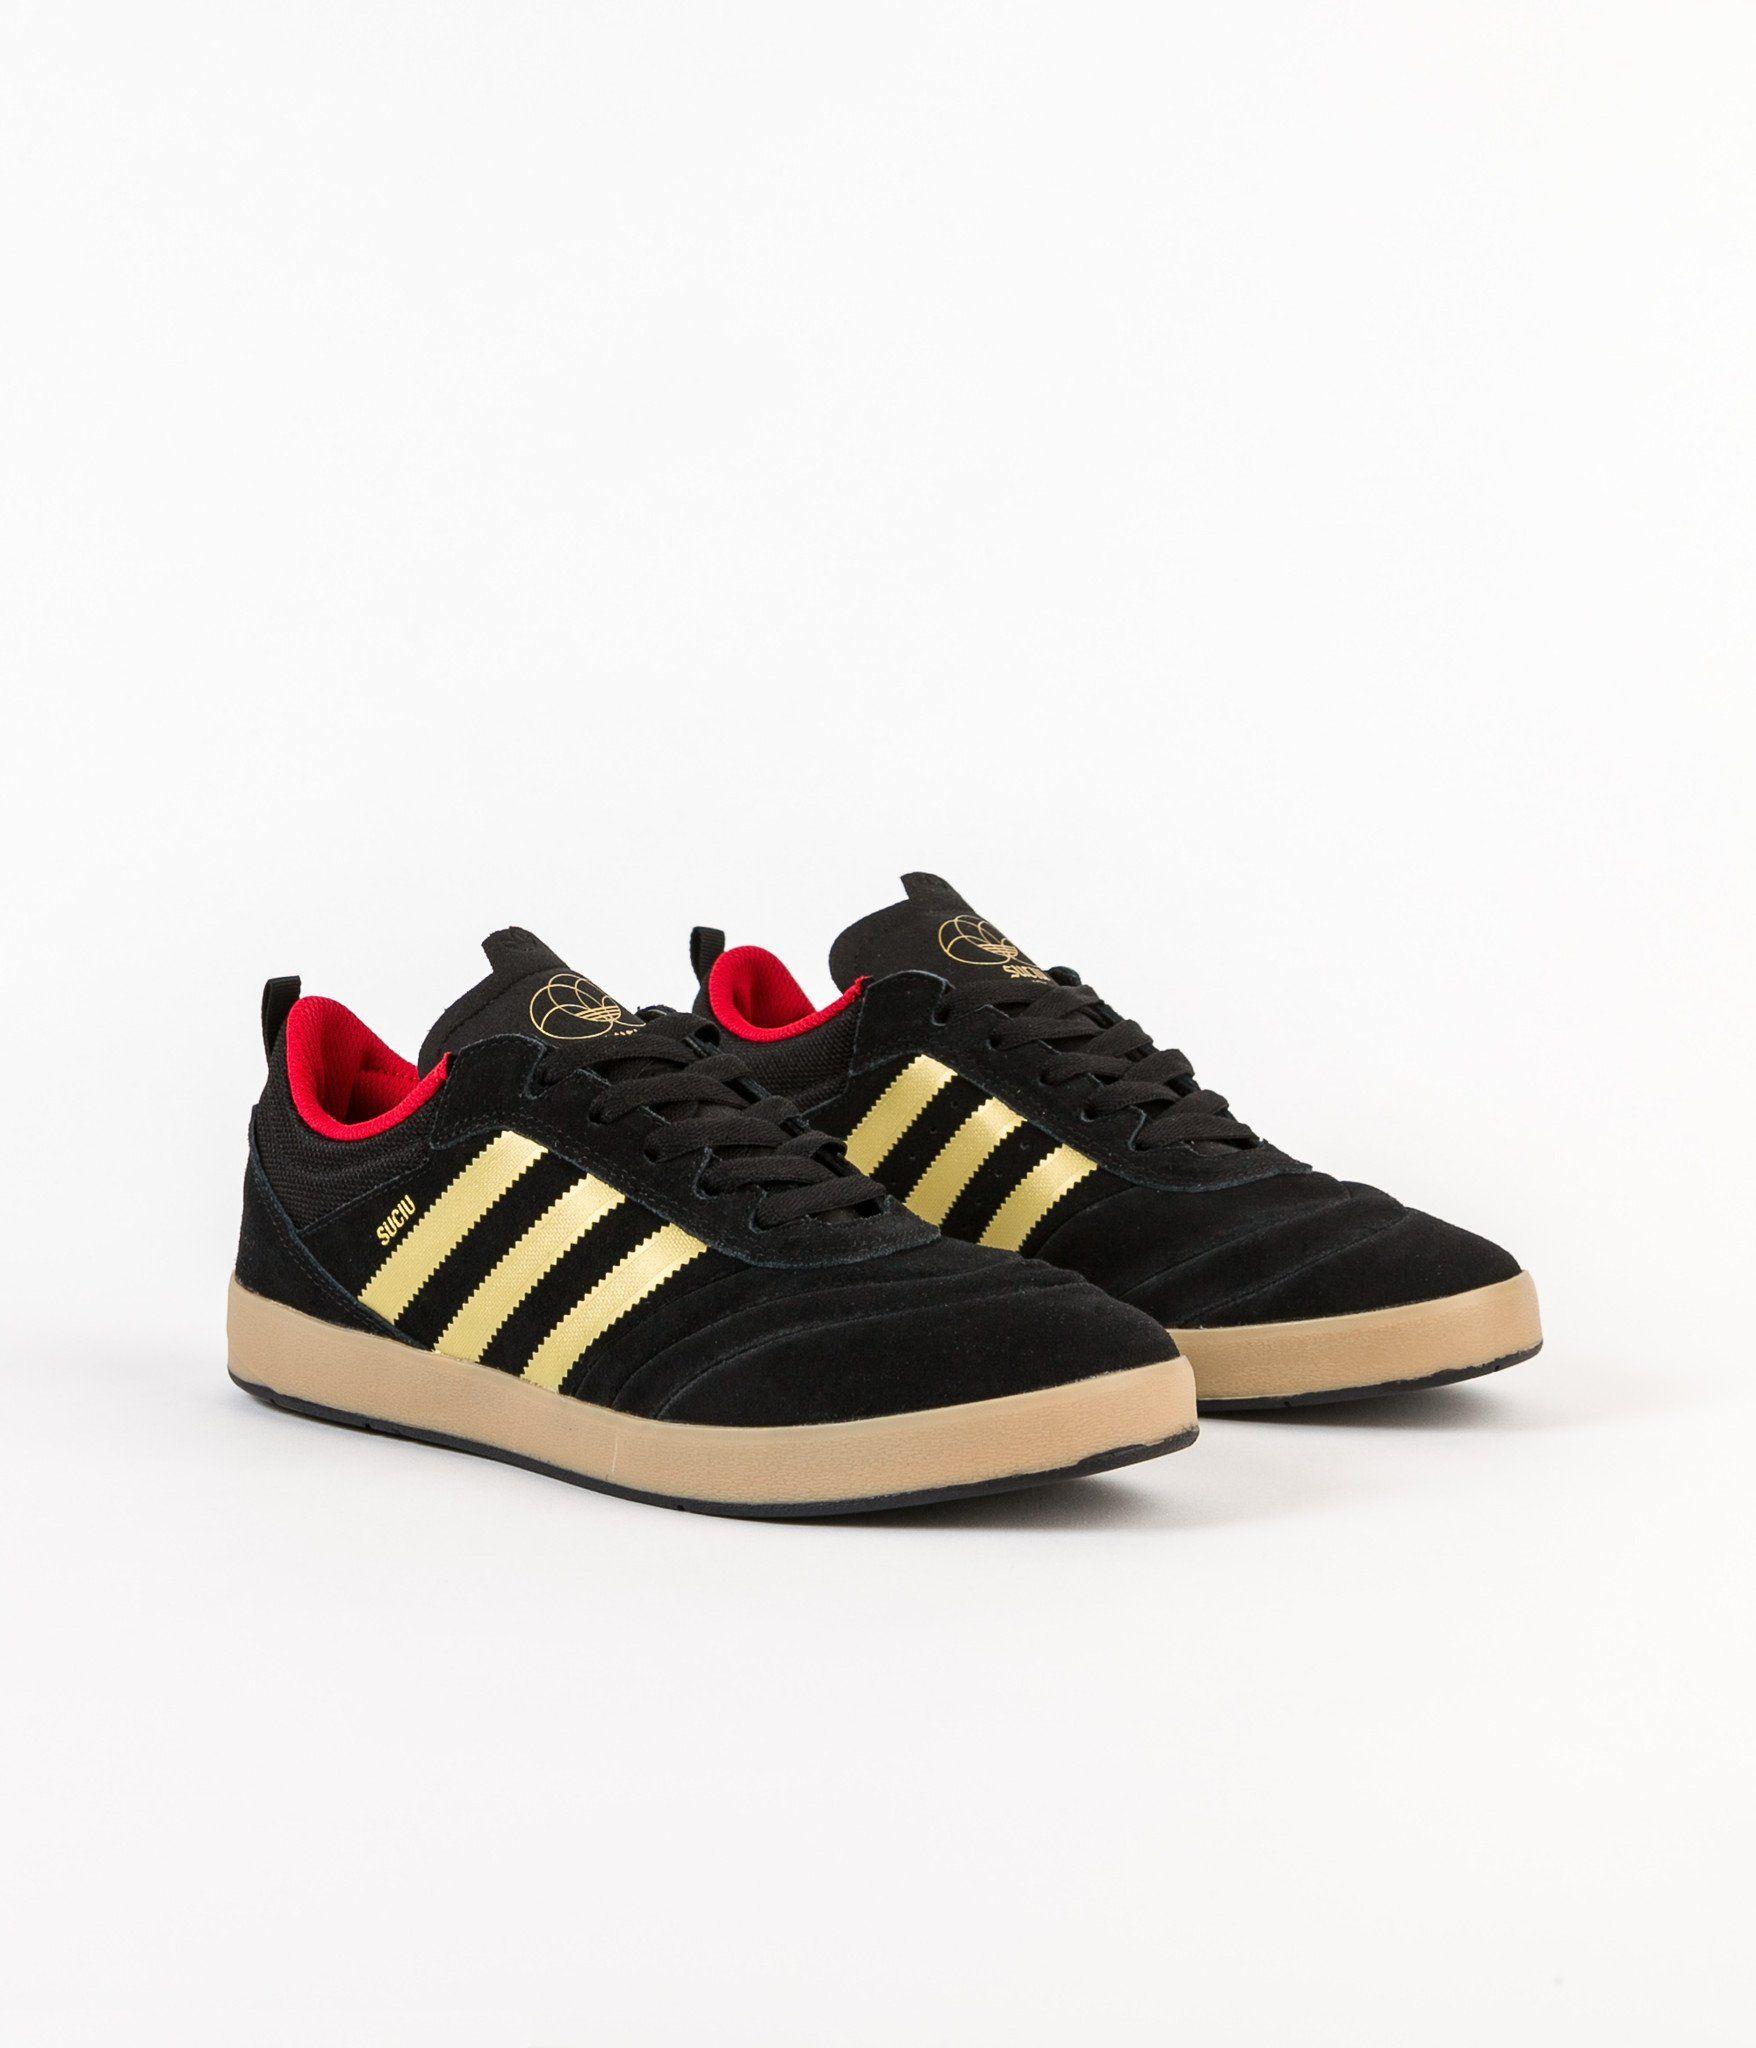 Adidas Suciu Adv Shoes - Core Black   Gold Foil   Gum4 Skateboard Store 3f683b803